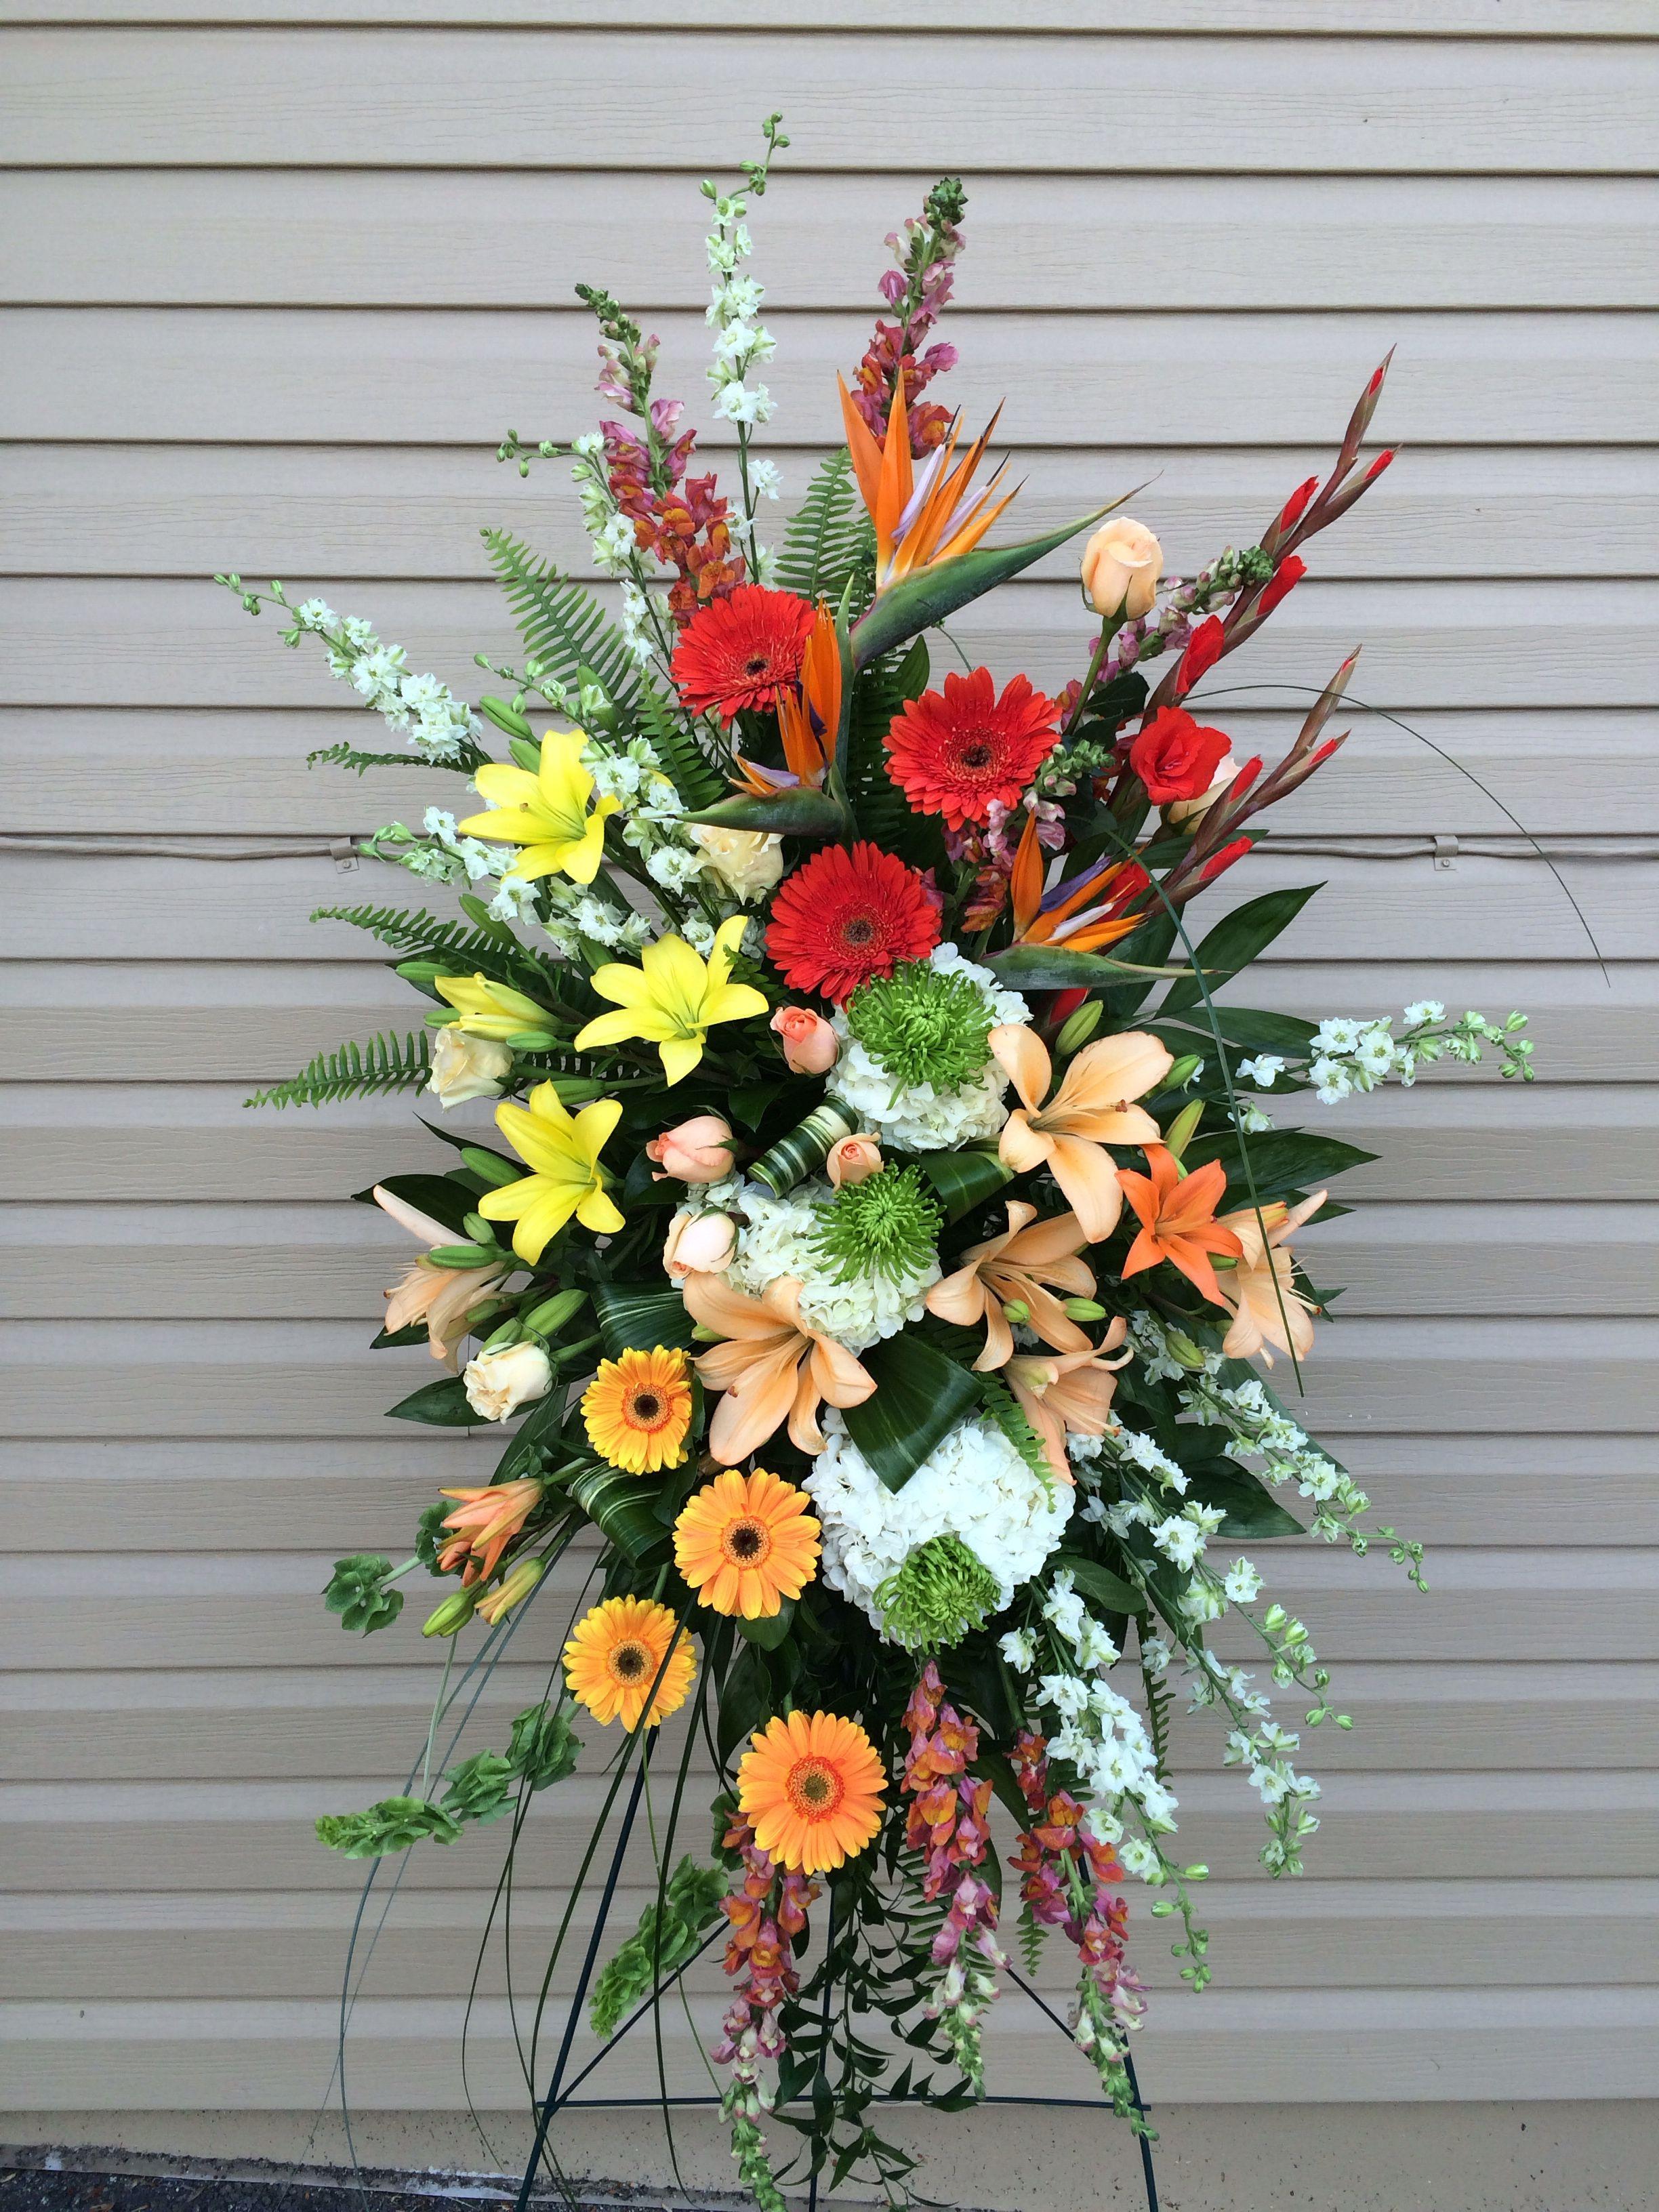 Sympathy spray funeral flowers tropical floralcreations funeral sympathy spray funeral flowers tropical floralcreations izmirmasajfo